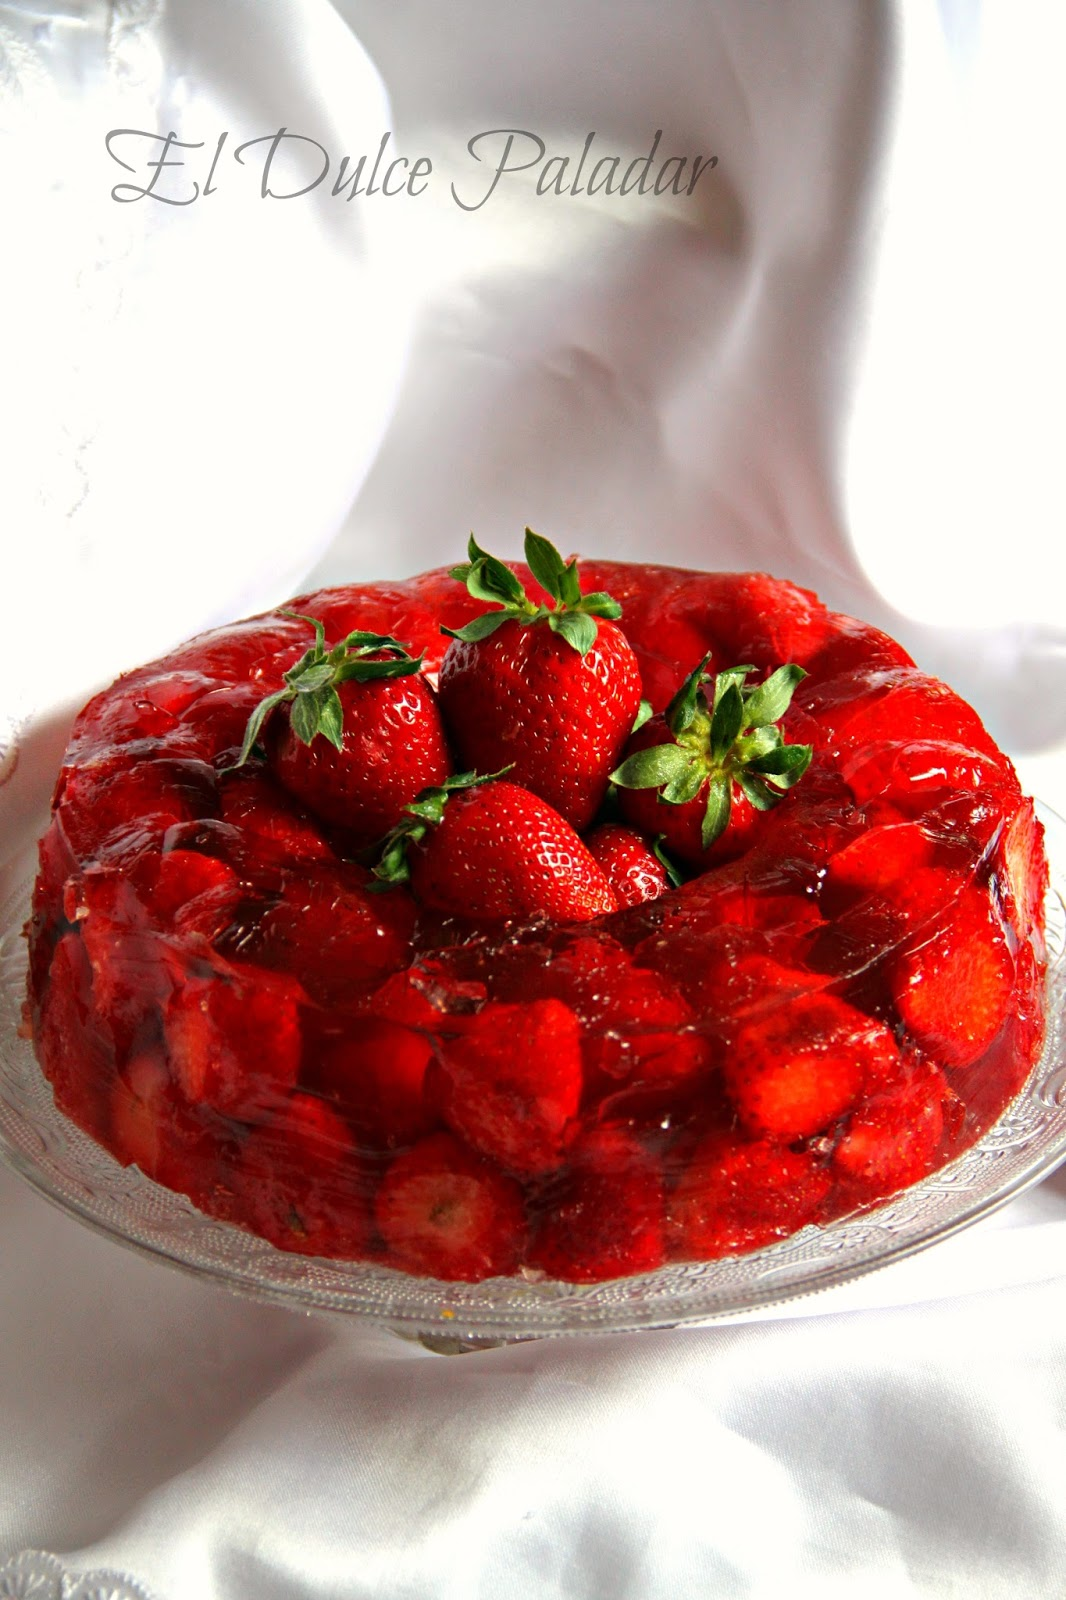 Gelatina de fresas - El dulce paladar